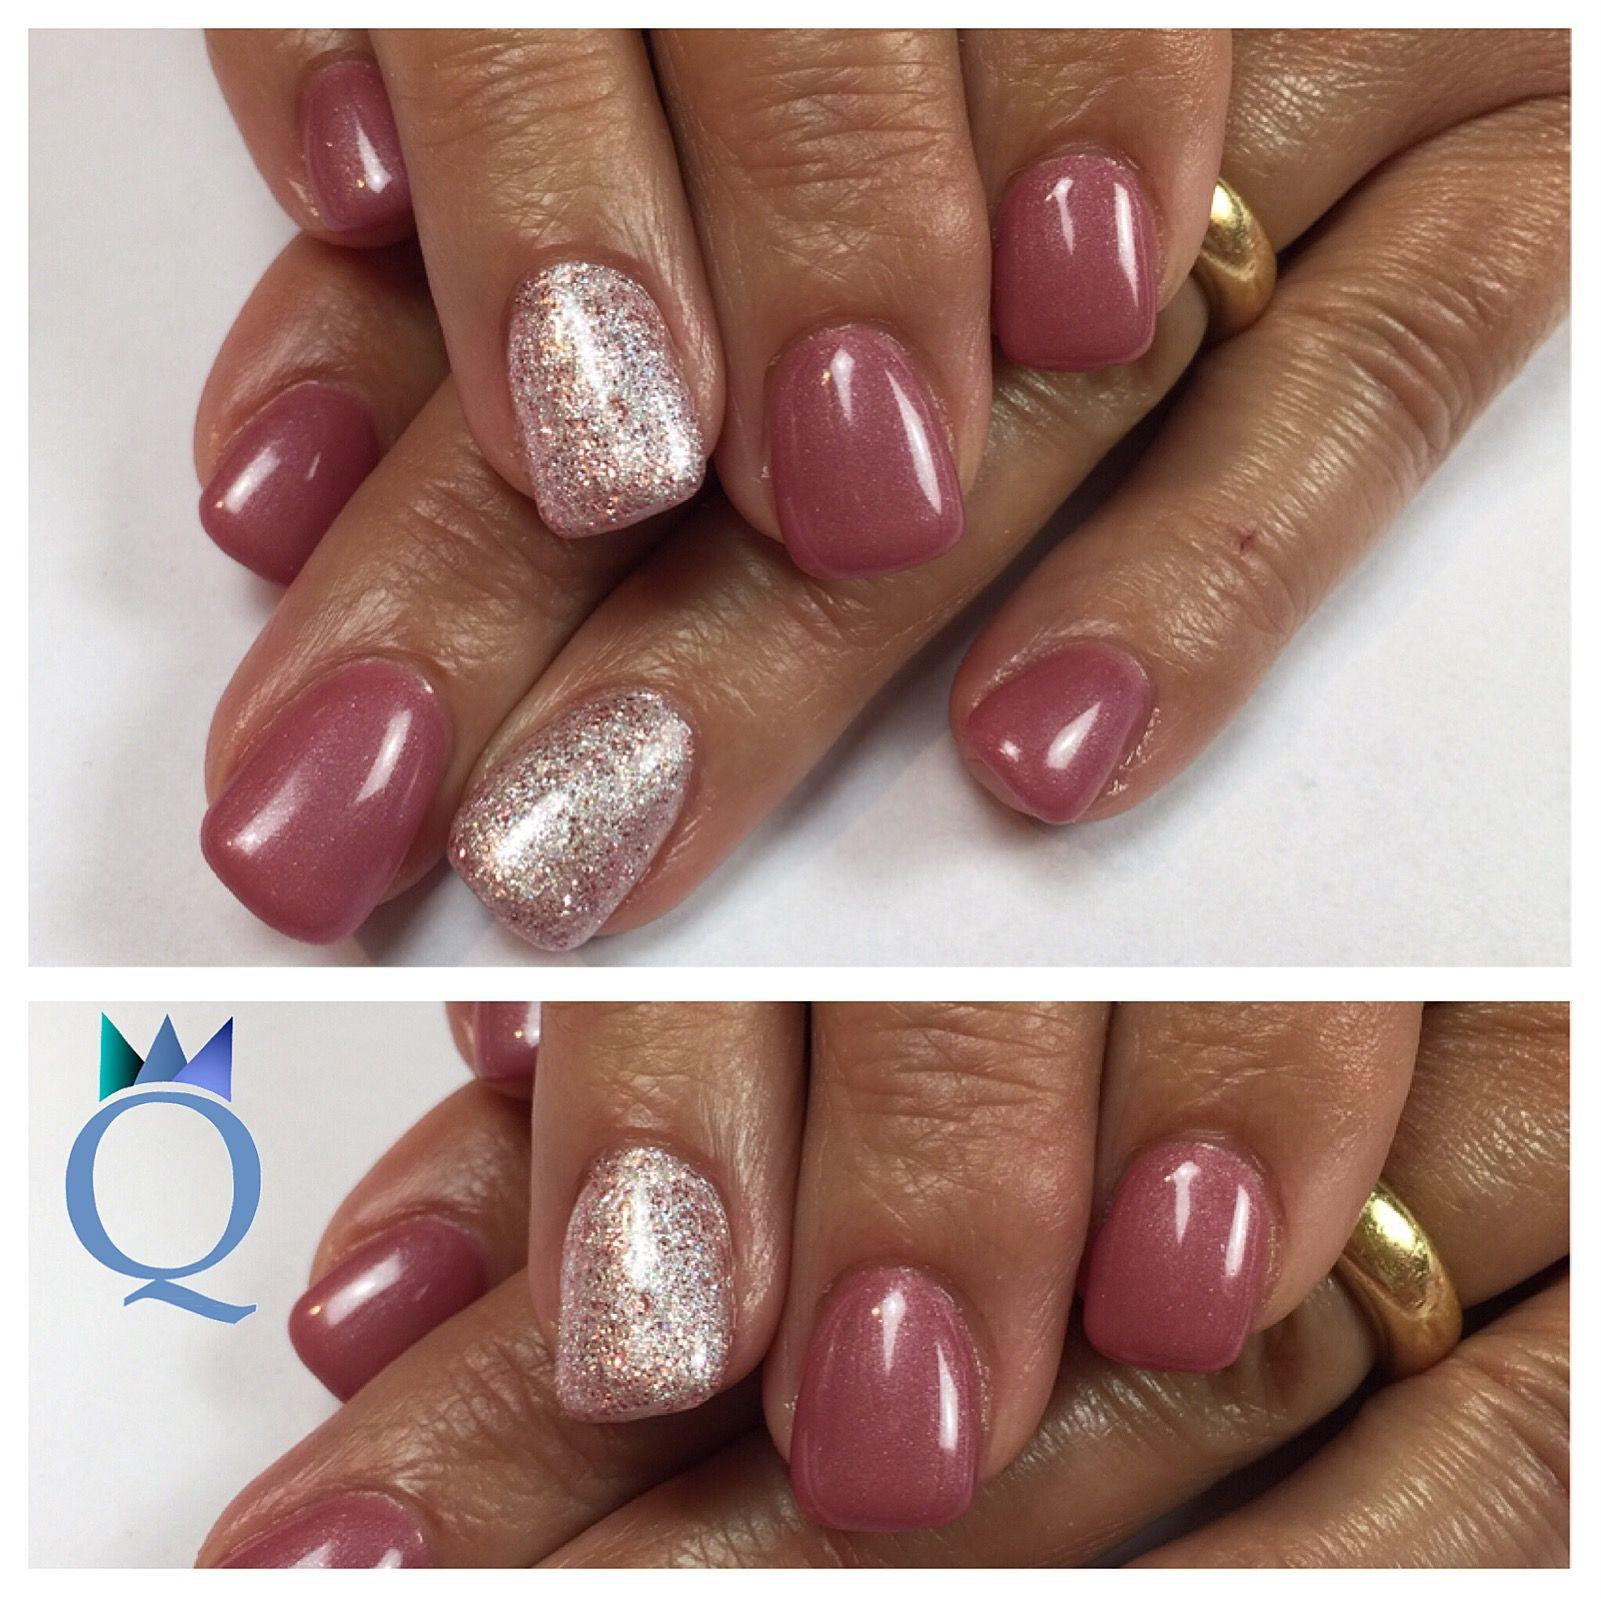 shortnails #gelnails #nails #white #glitter #mauve #kurzenägel ...